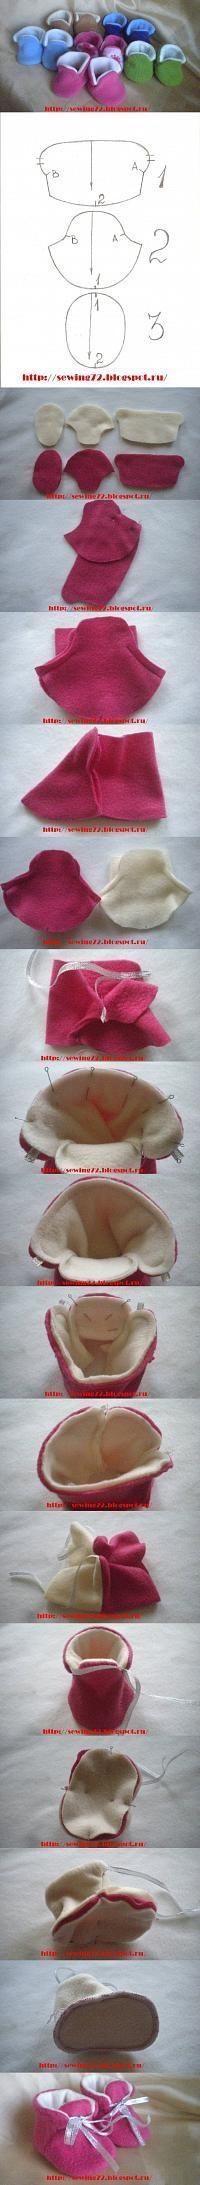 DIY Home and Crafts: DIY Fleece Booties DIY Projects | UsefulDIY.com - DIY Refashion